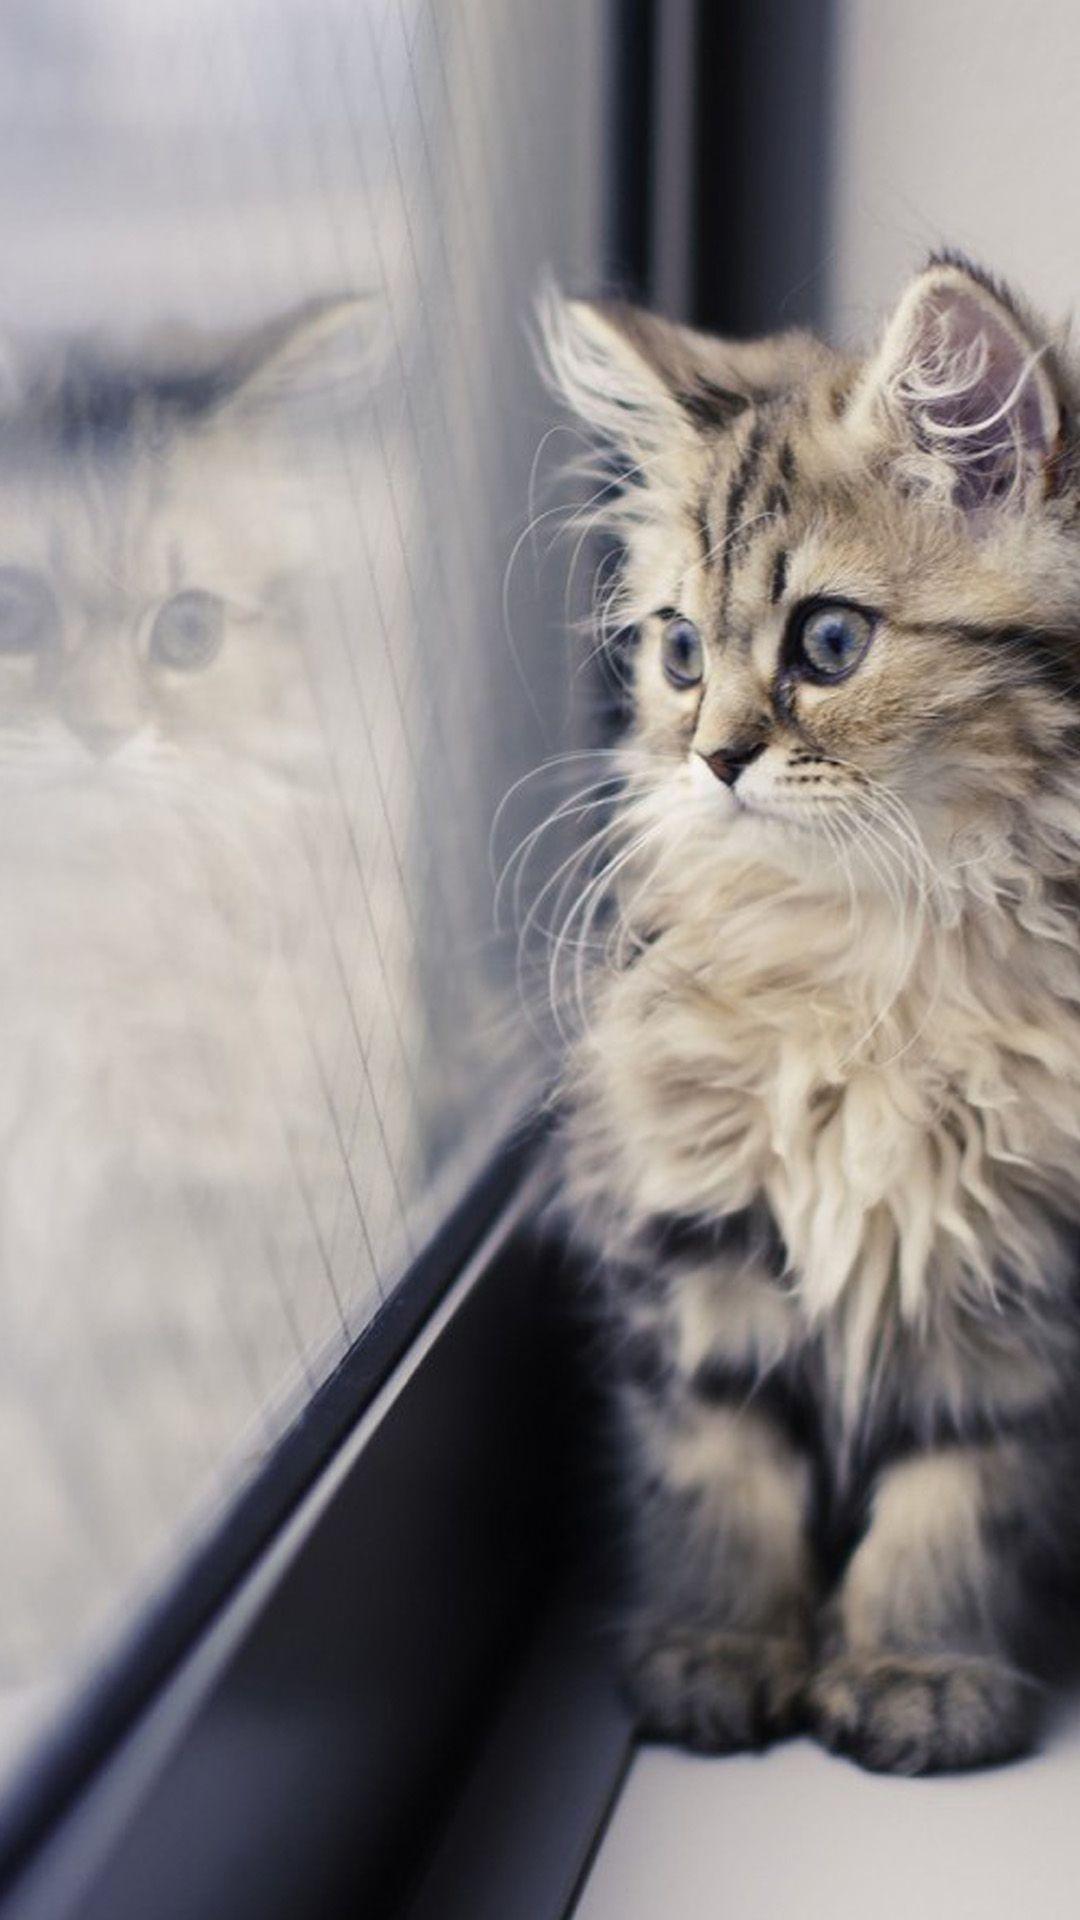 Cute Cat Iphone Hd Wallpapers Top Free Cute Cat Iphone Hd Backgrounds Wallpaperaccess